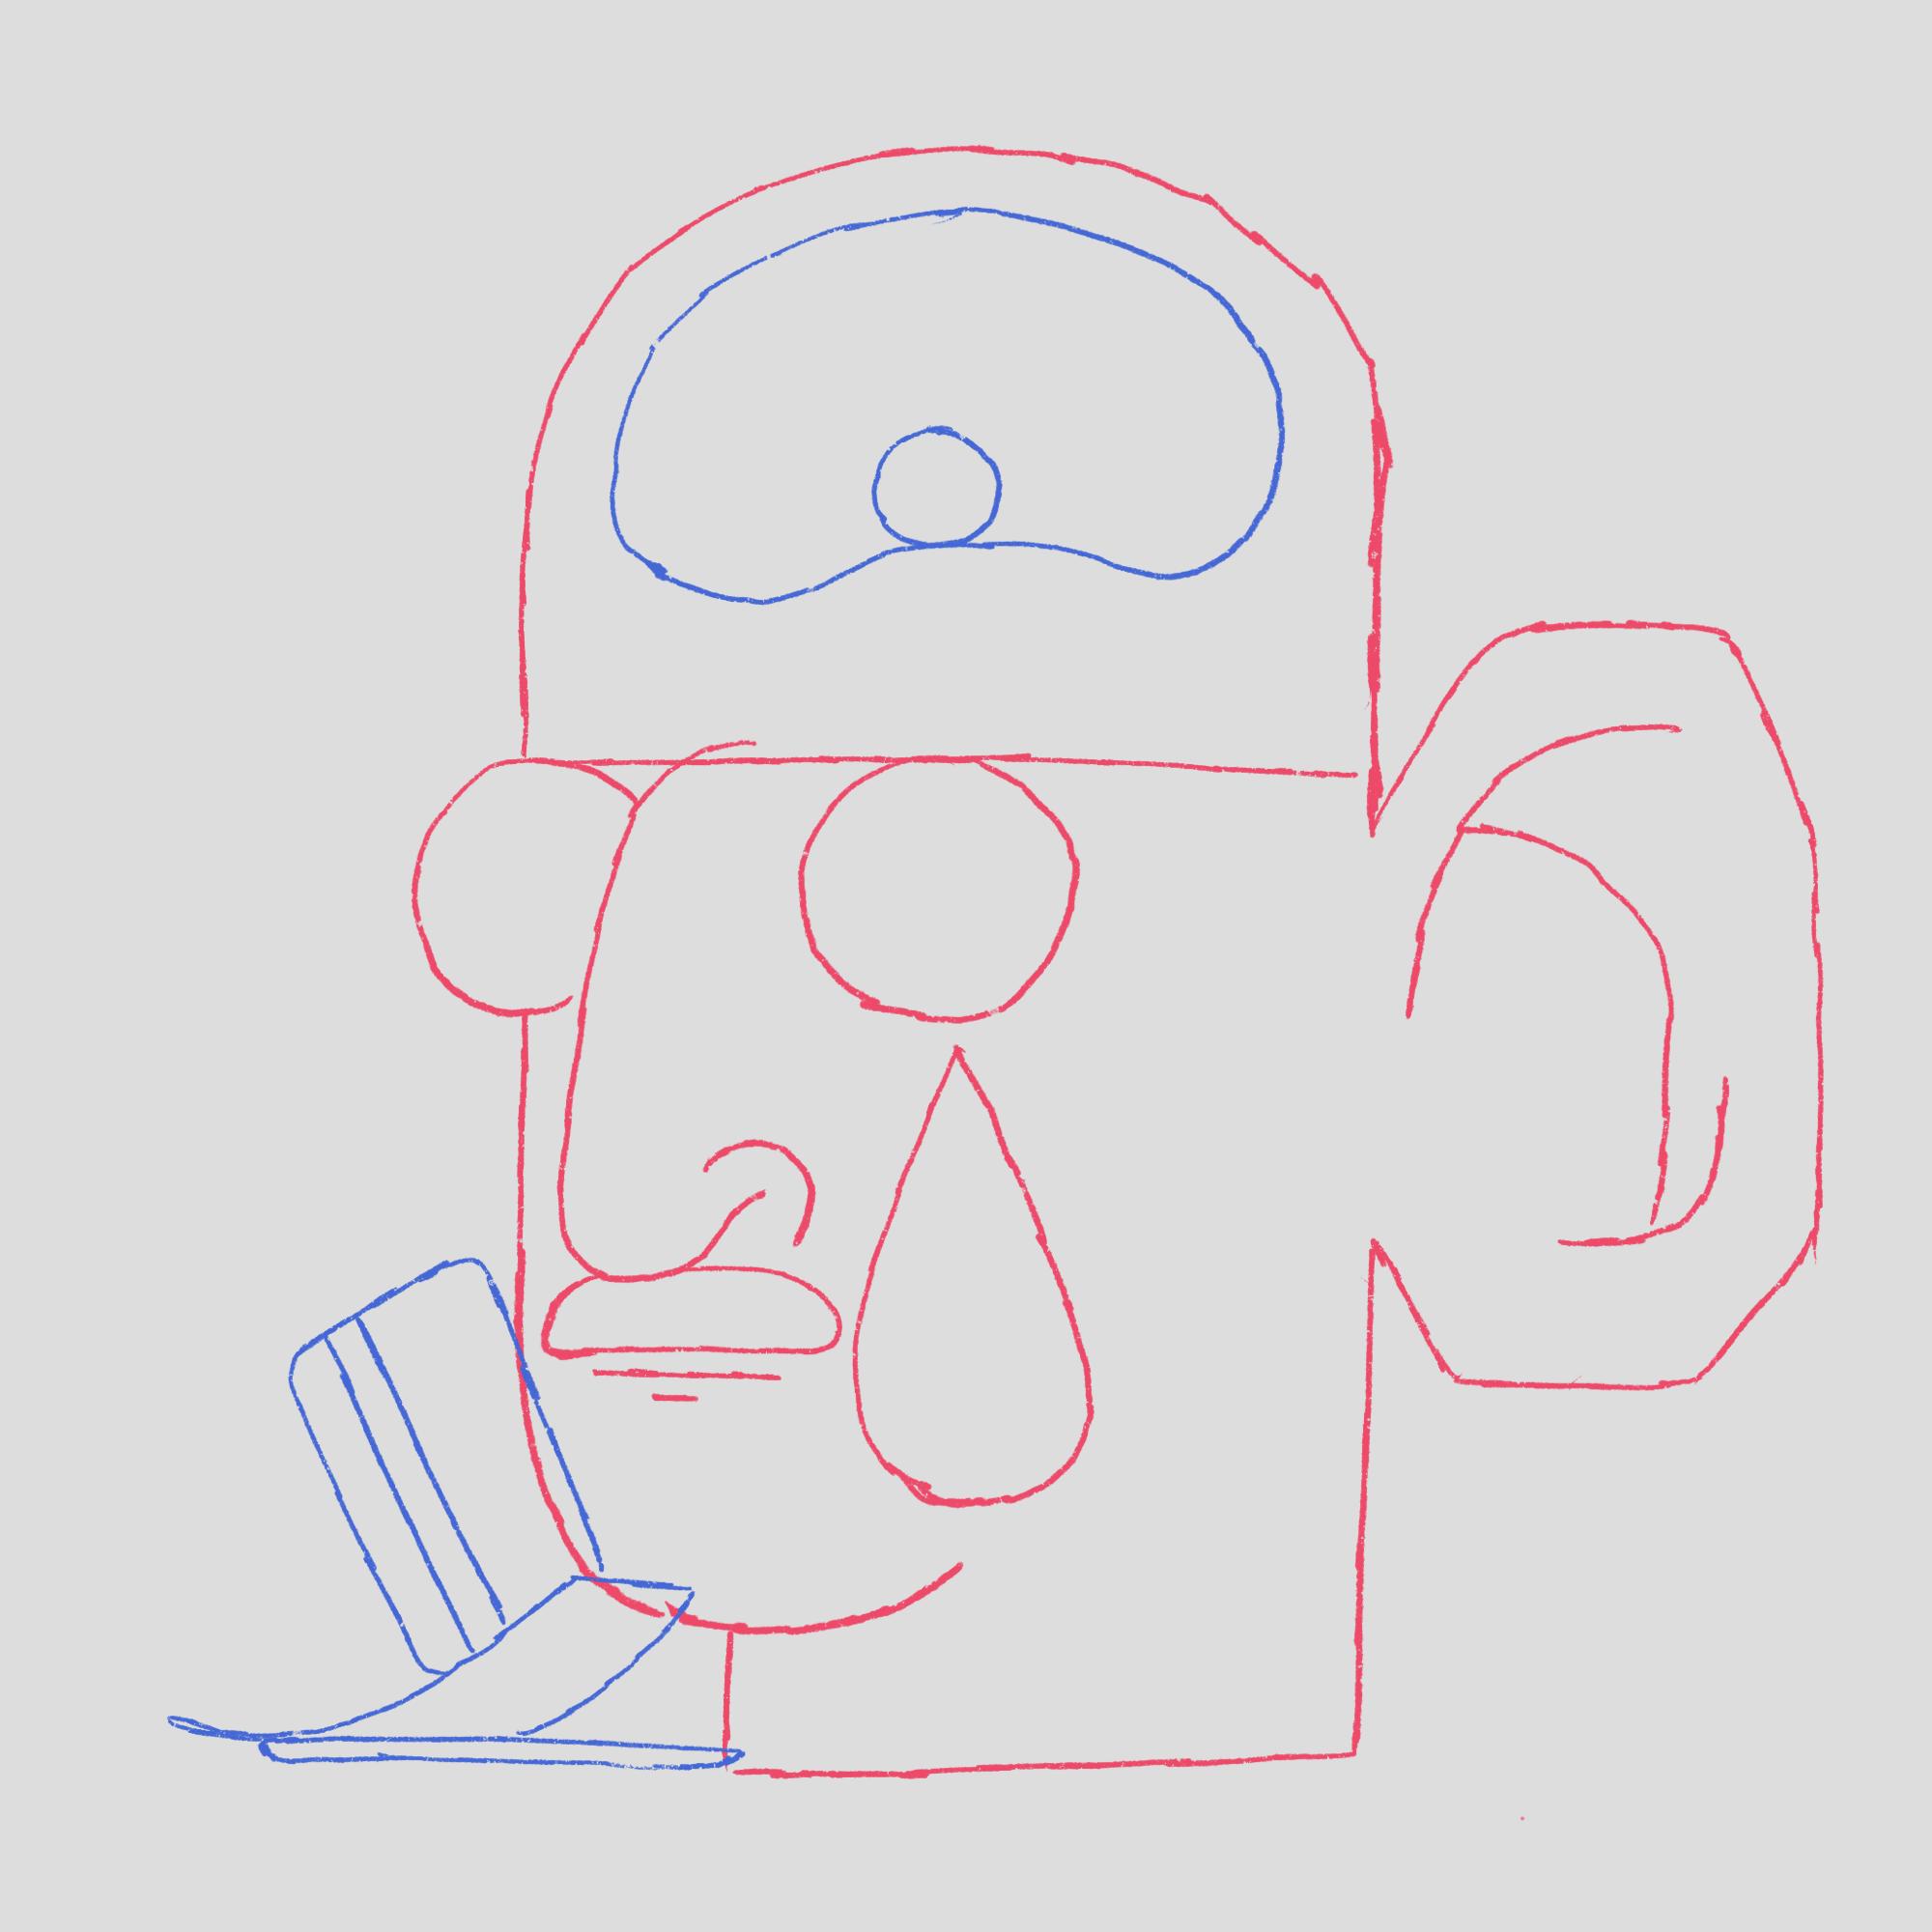 Initial Sketch.png